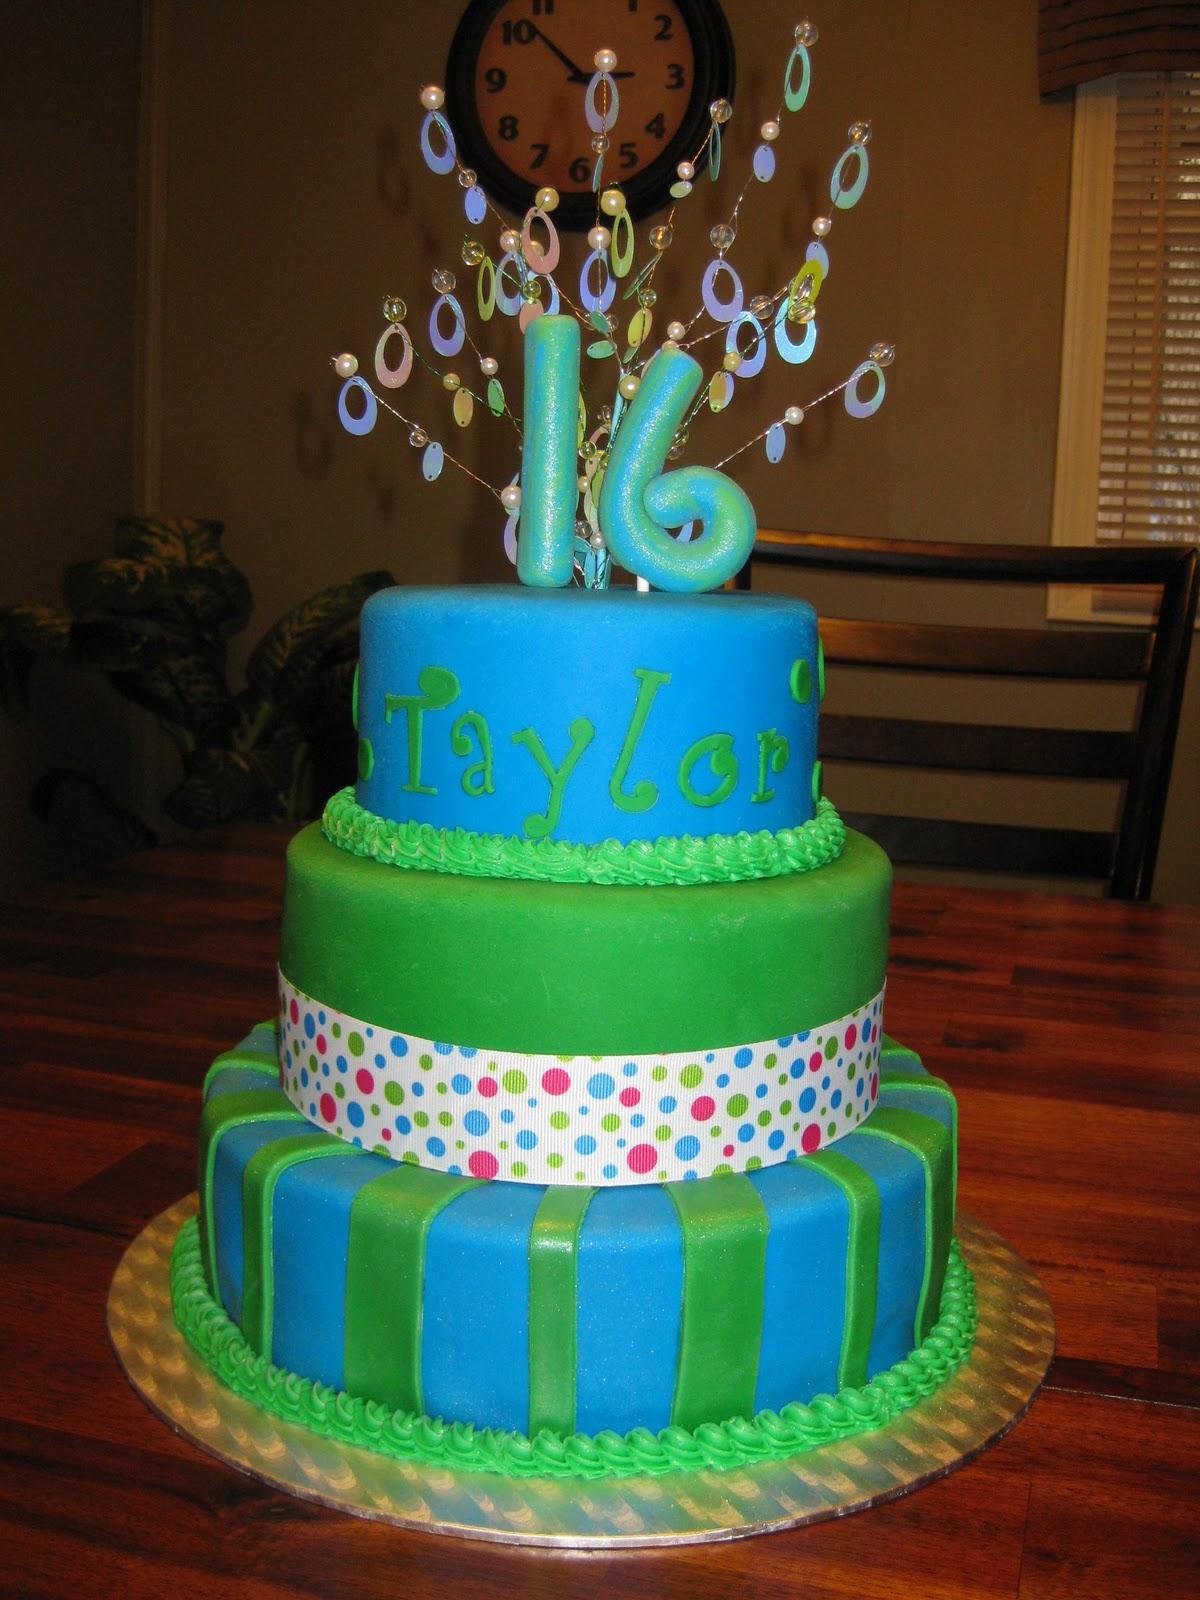 Birthday Cake Ideas With Sweets : Ashlynn Leigh Cakes: Sweet 16 Birthday Cake